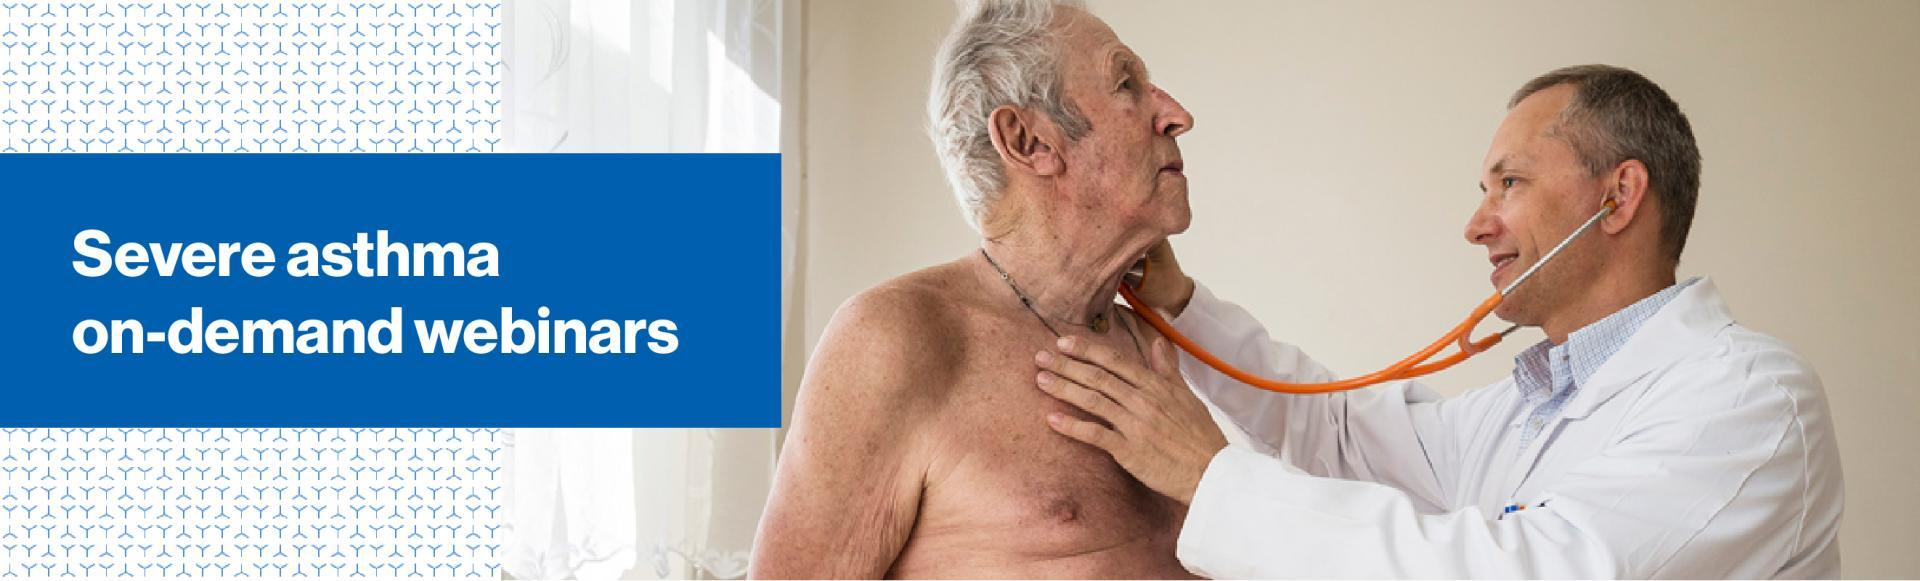 Top Banner: Severe asthma on-demand webinars